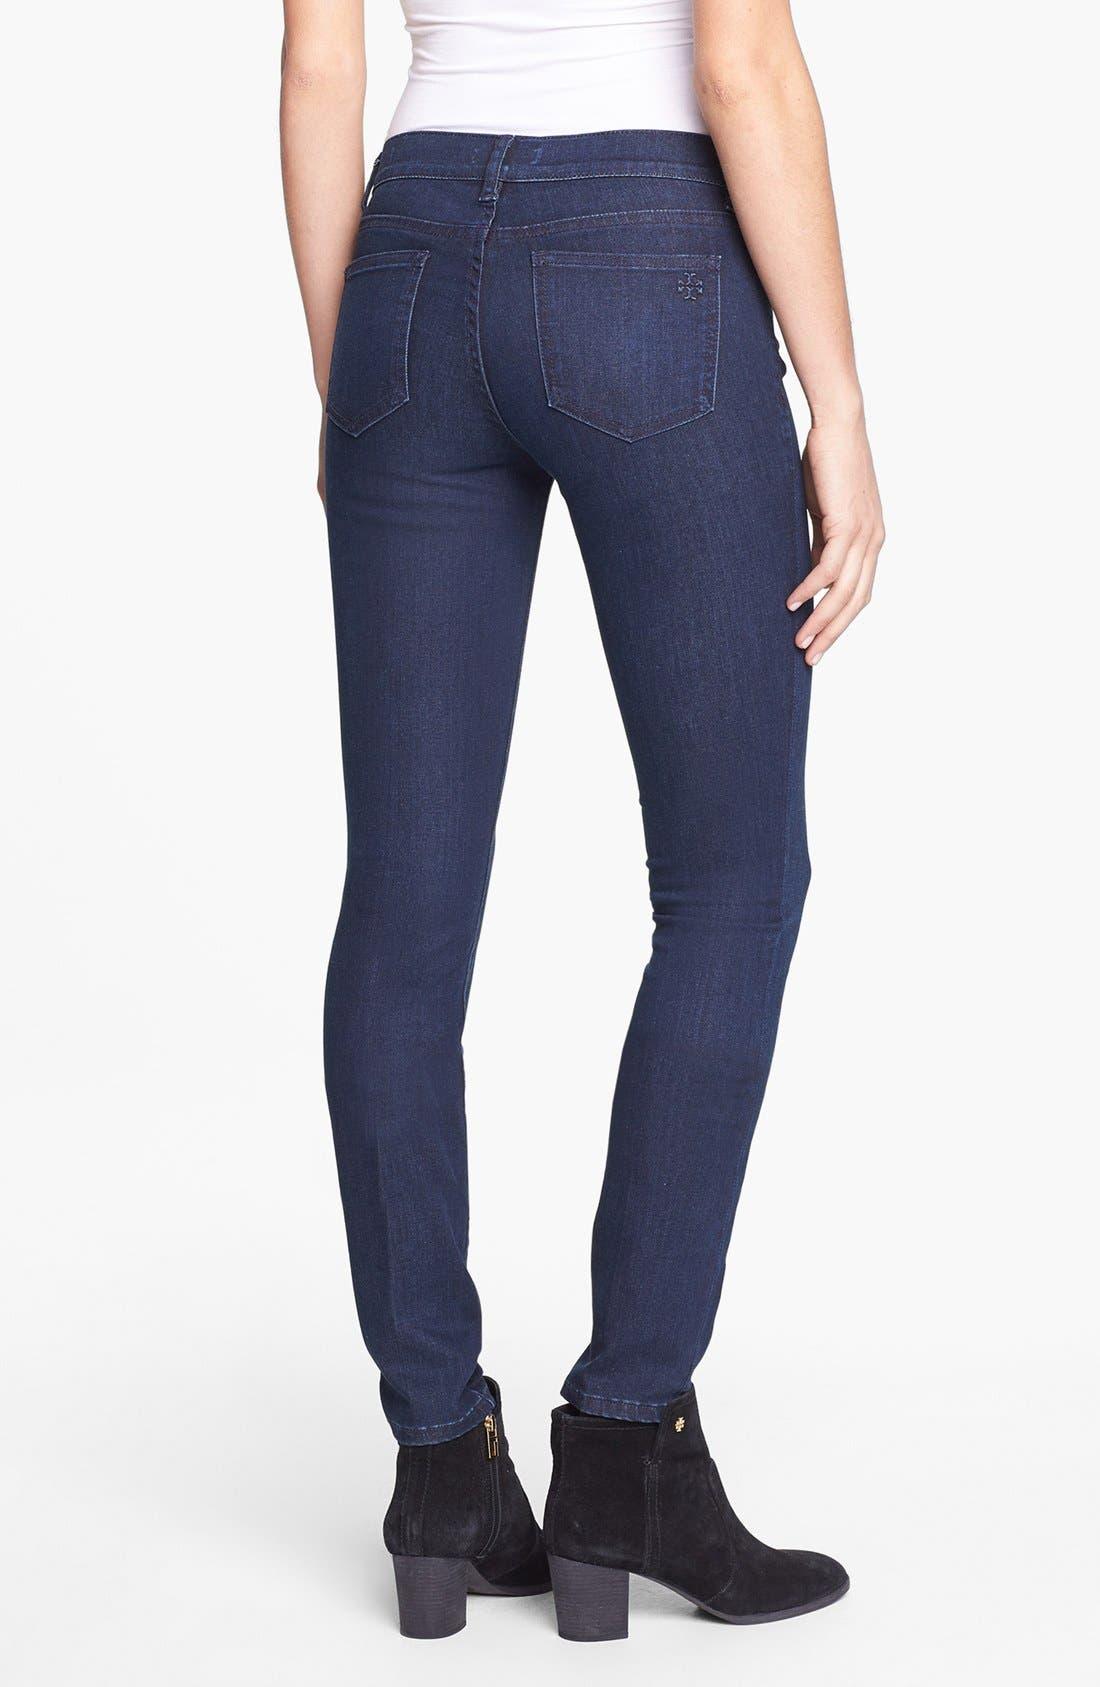 Alternate Image 2  - Tory Burch Stretch Skinny Jeans (Rinse)